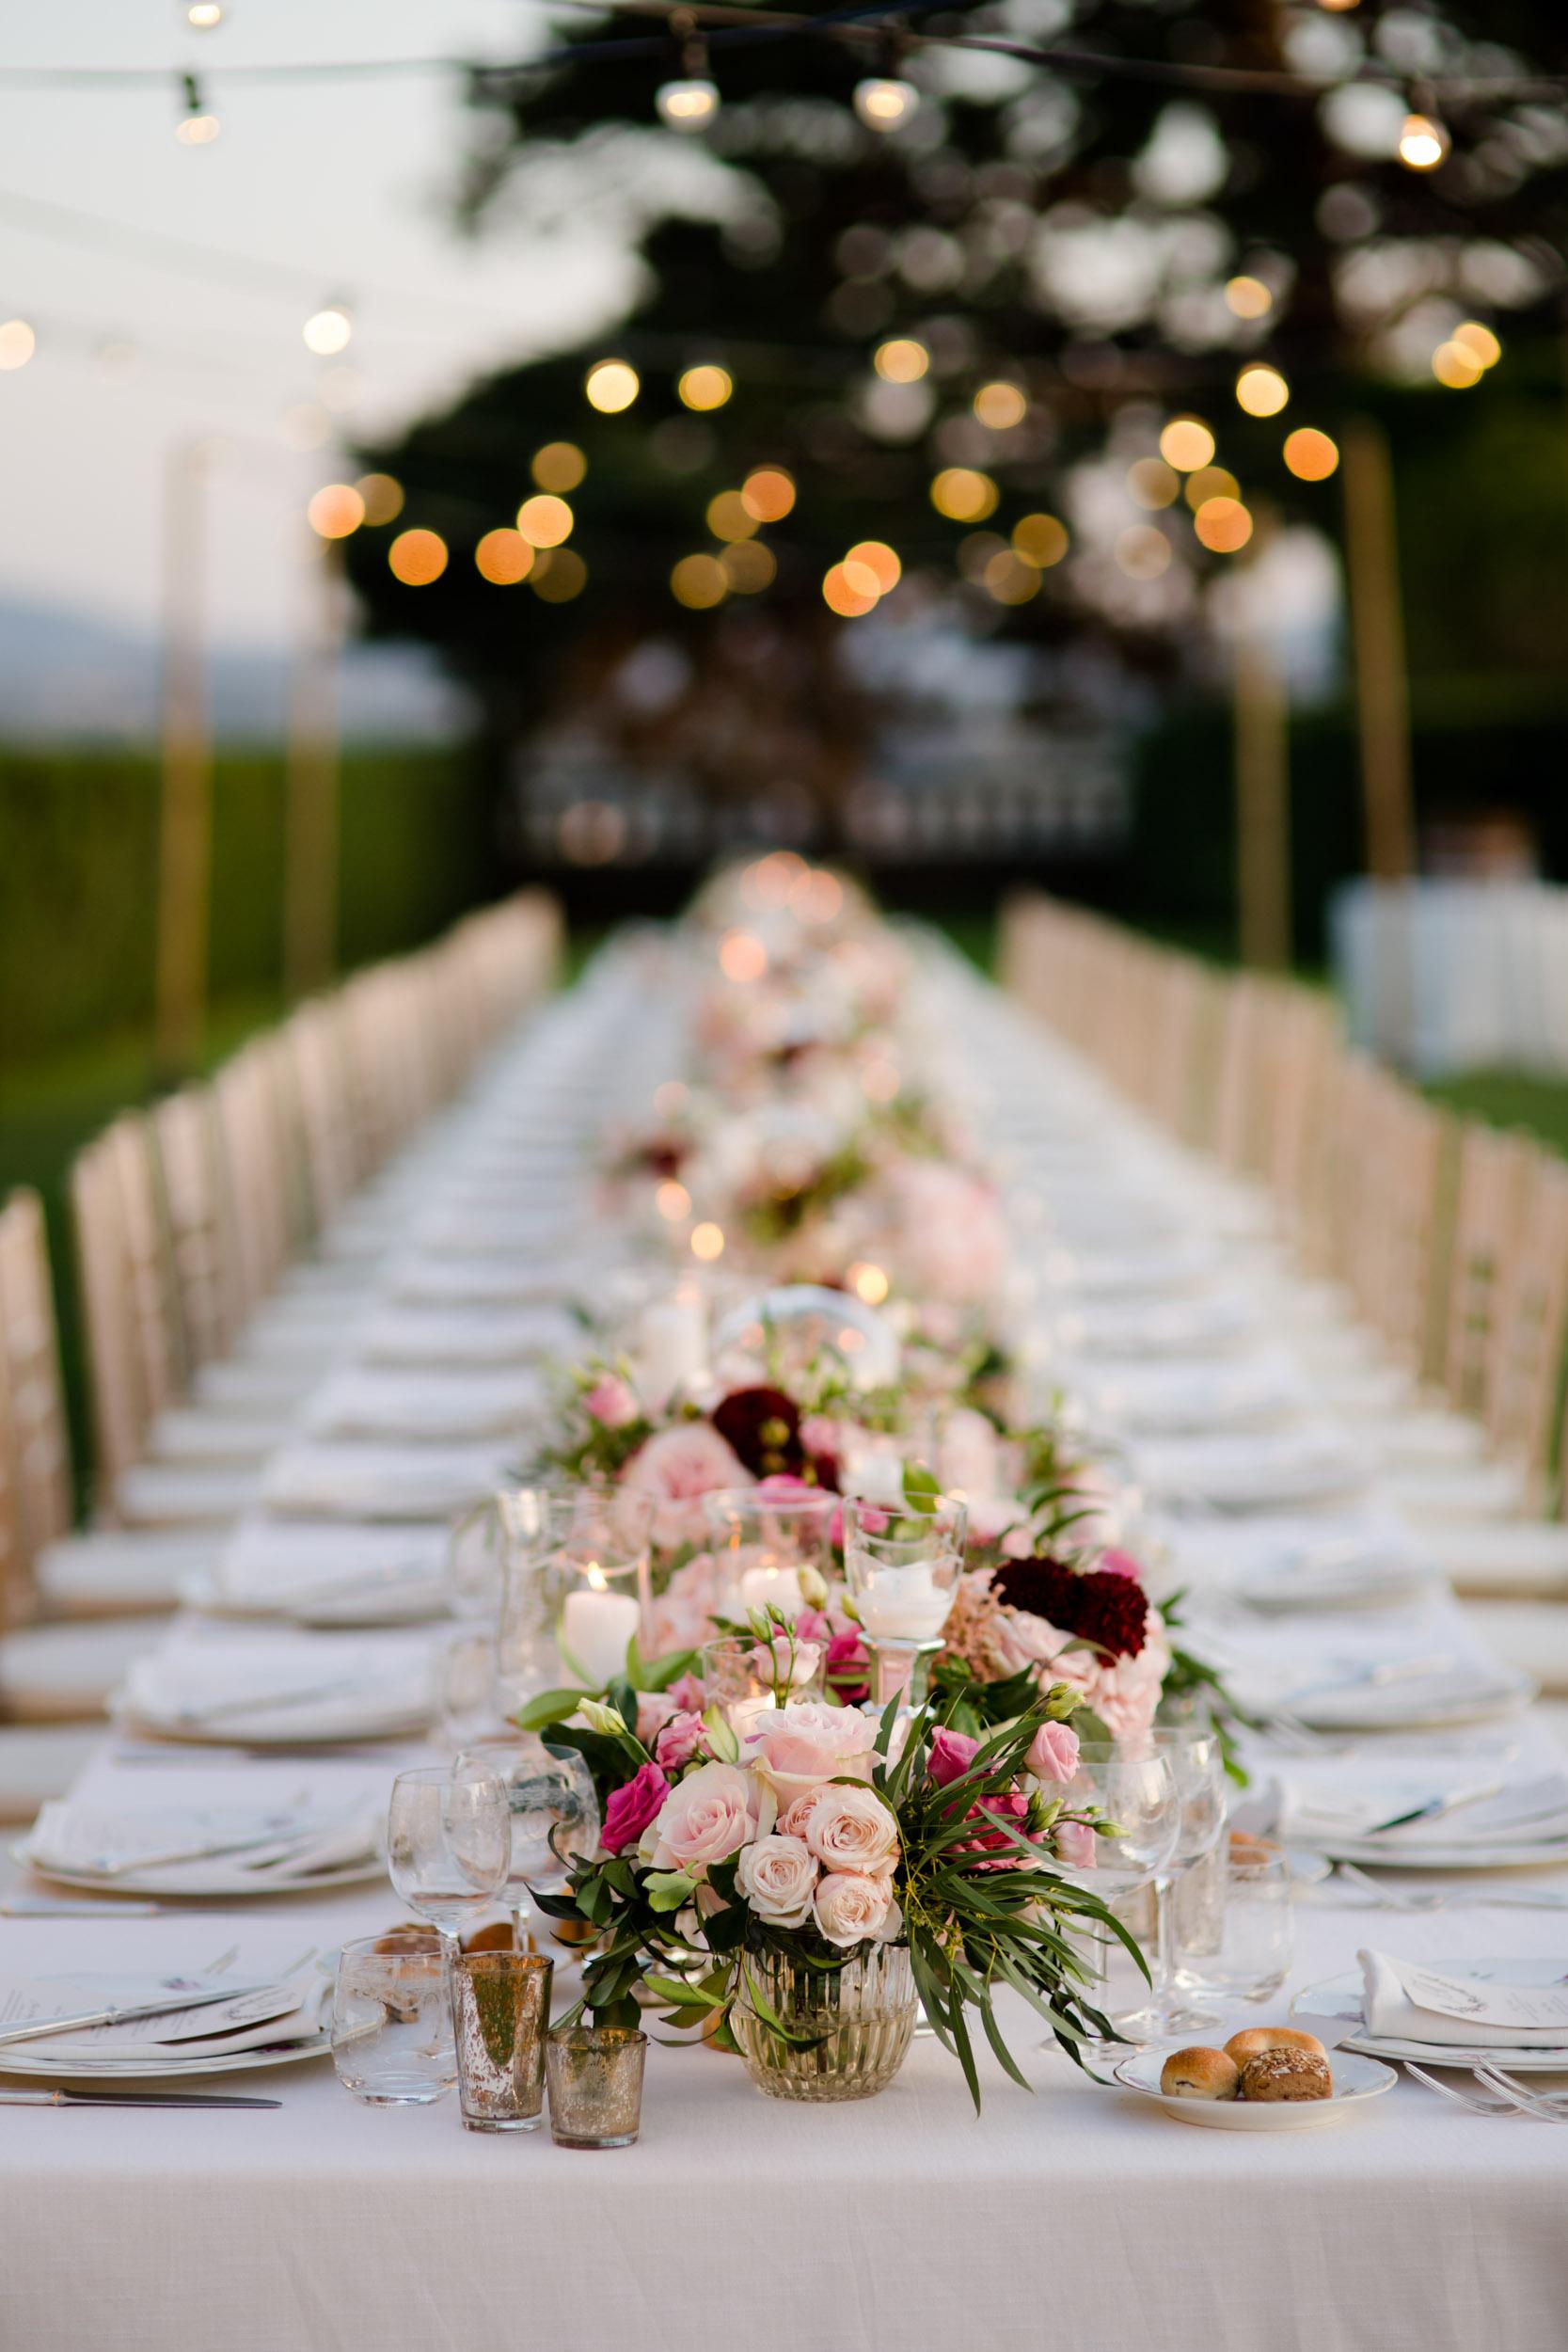 villa-gamberaia-florence-italy-destination-wedding-64.jpg